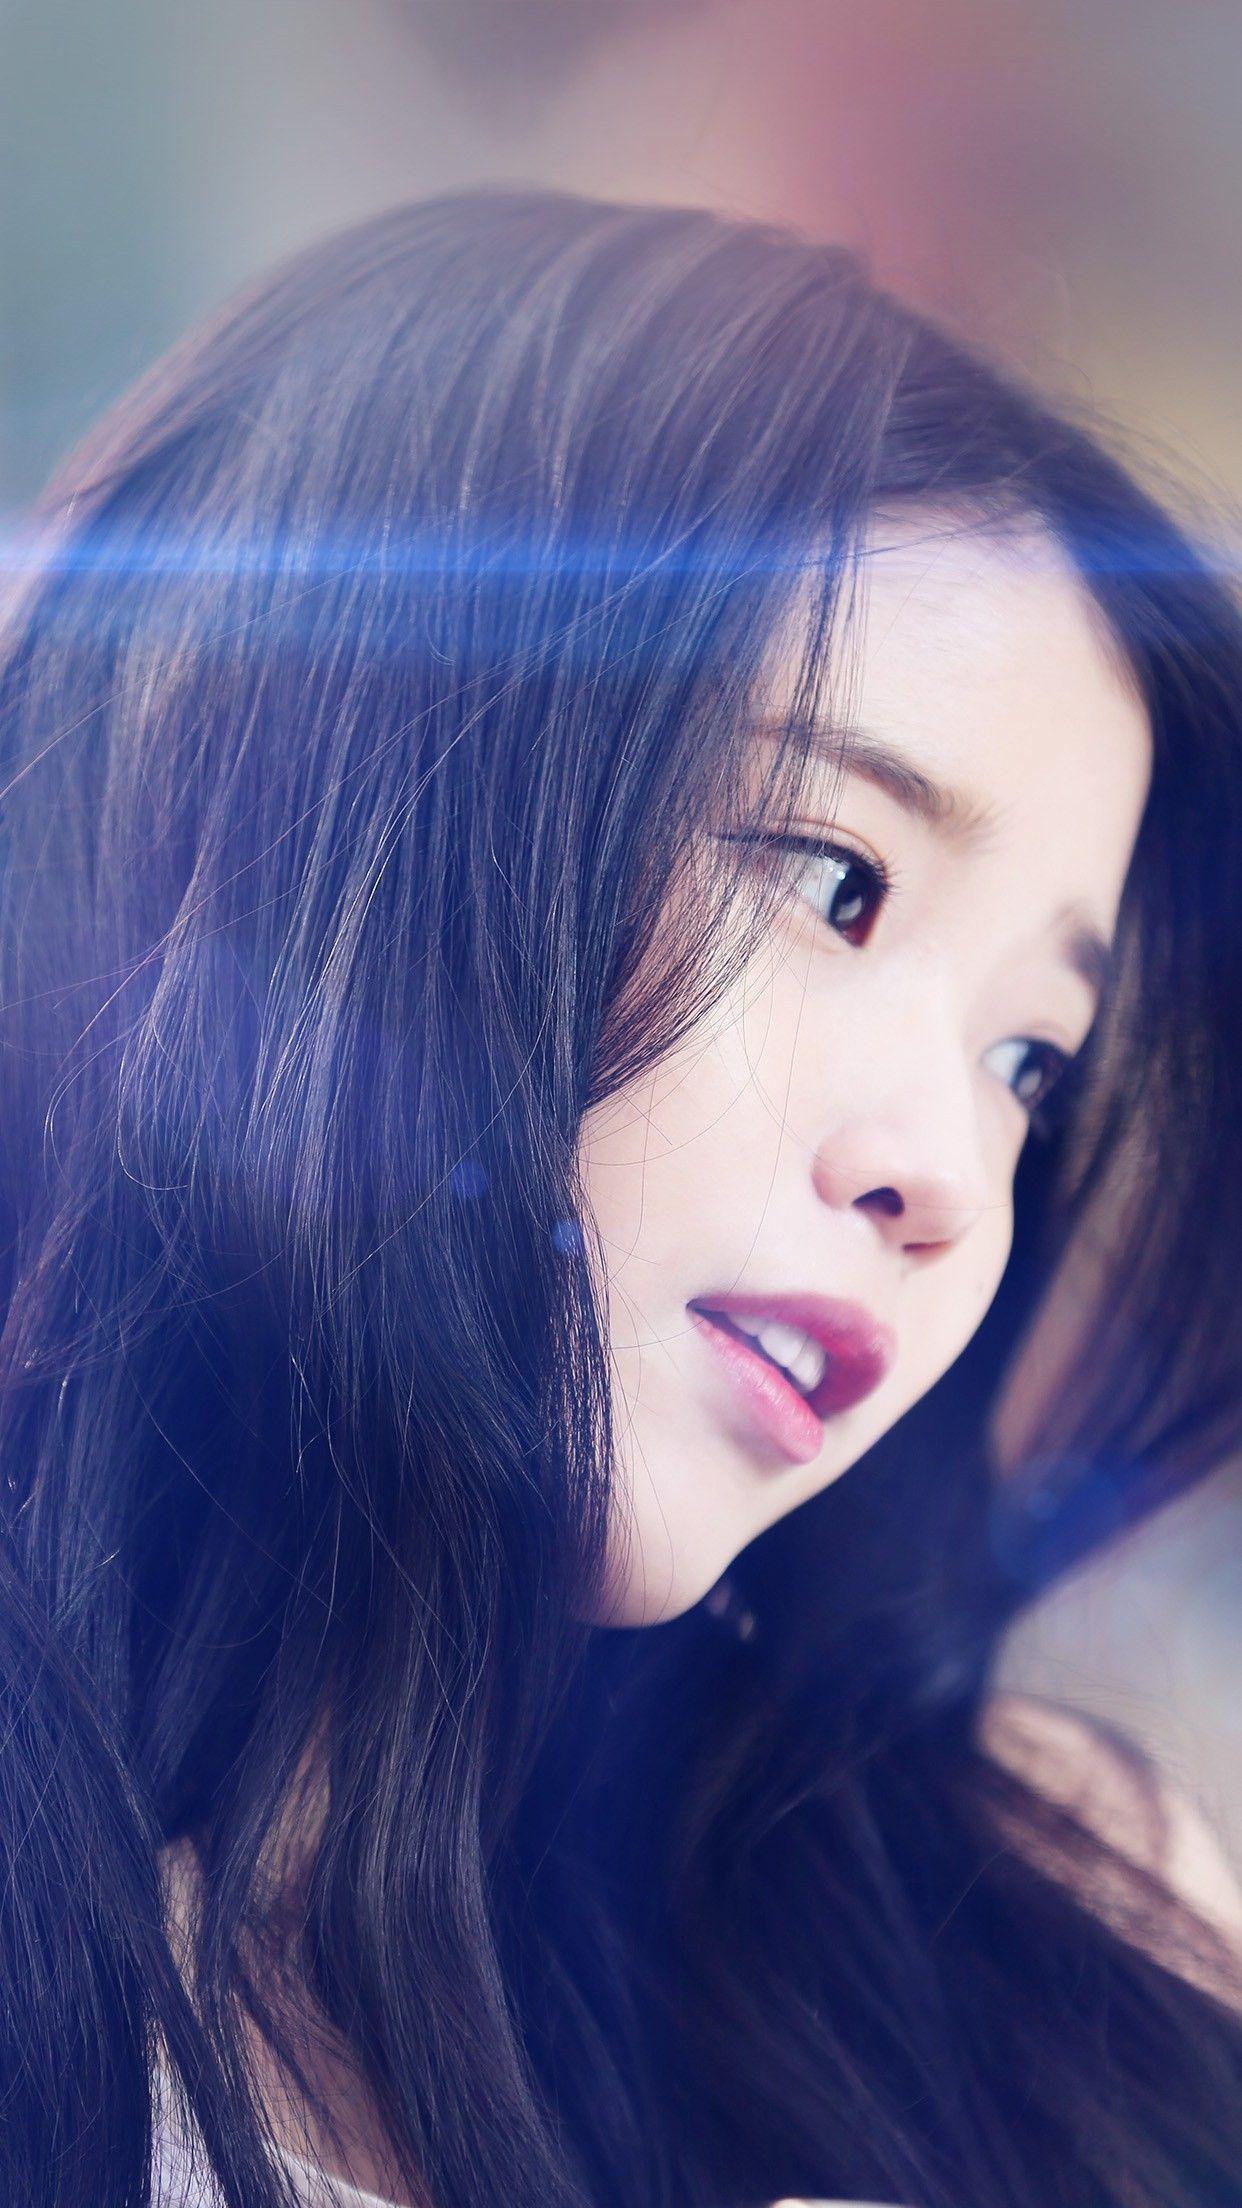 Korean / Actress / Singer에 있는 Tsang Eric님의 핀 미용 제품, 아시아의